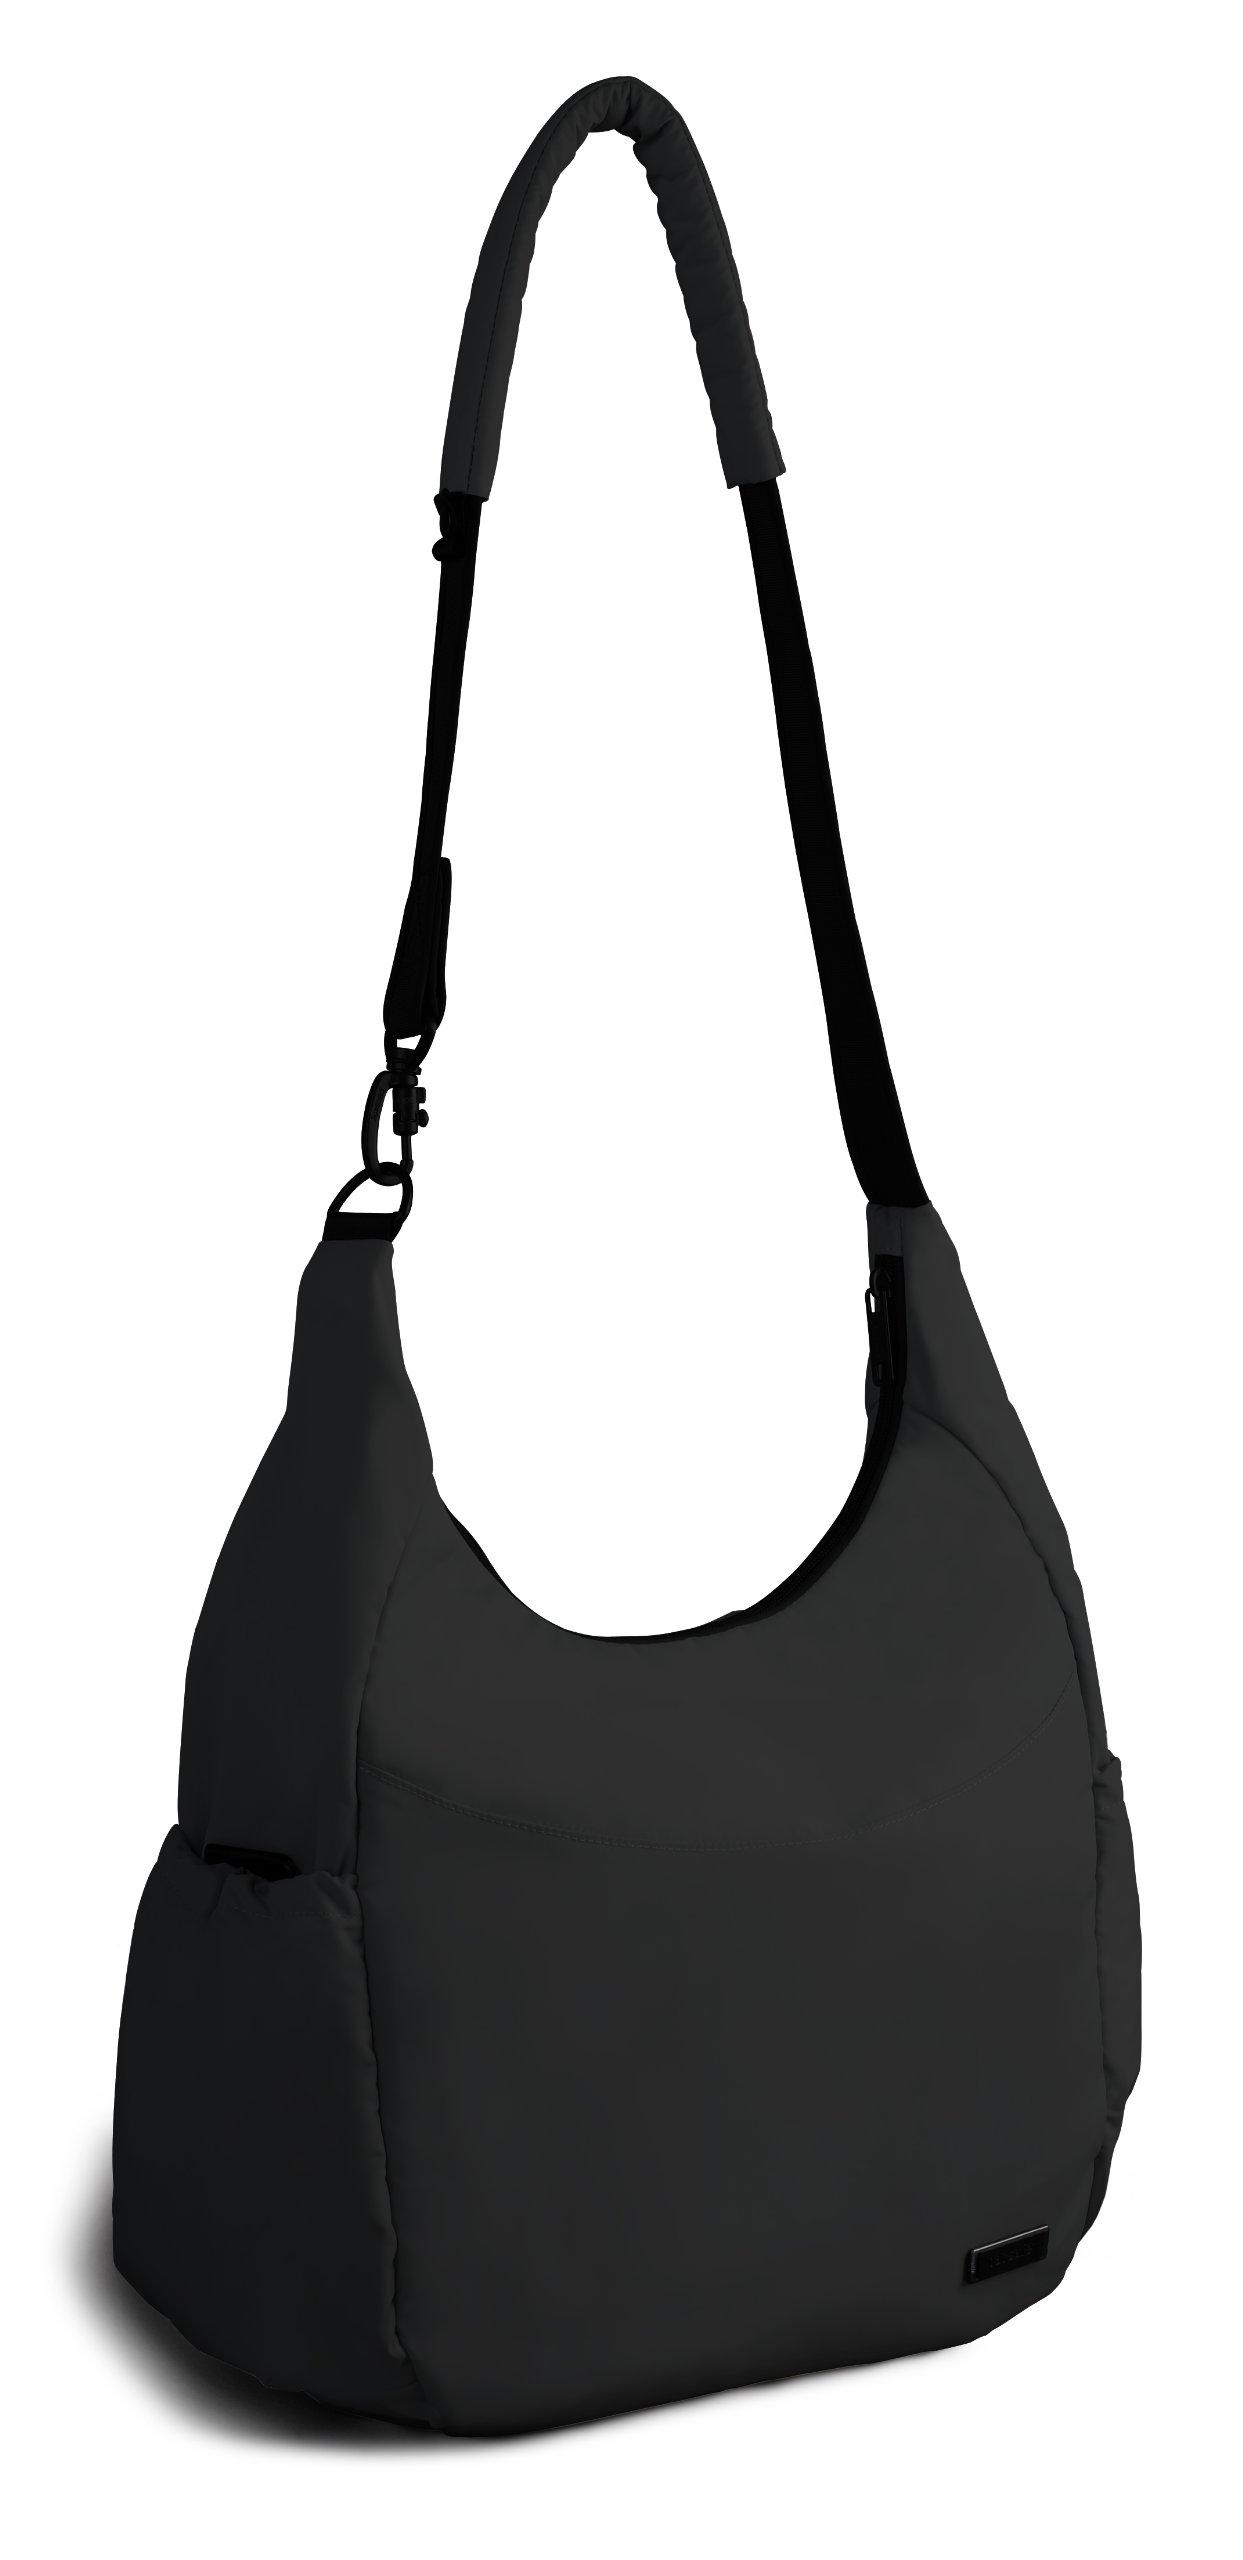 Pacsafe Citysafe 400 GII Hobo Travel Bag 0